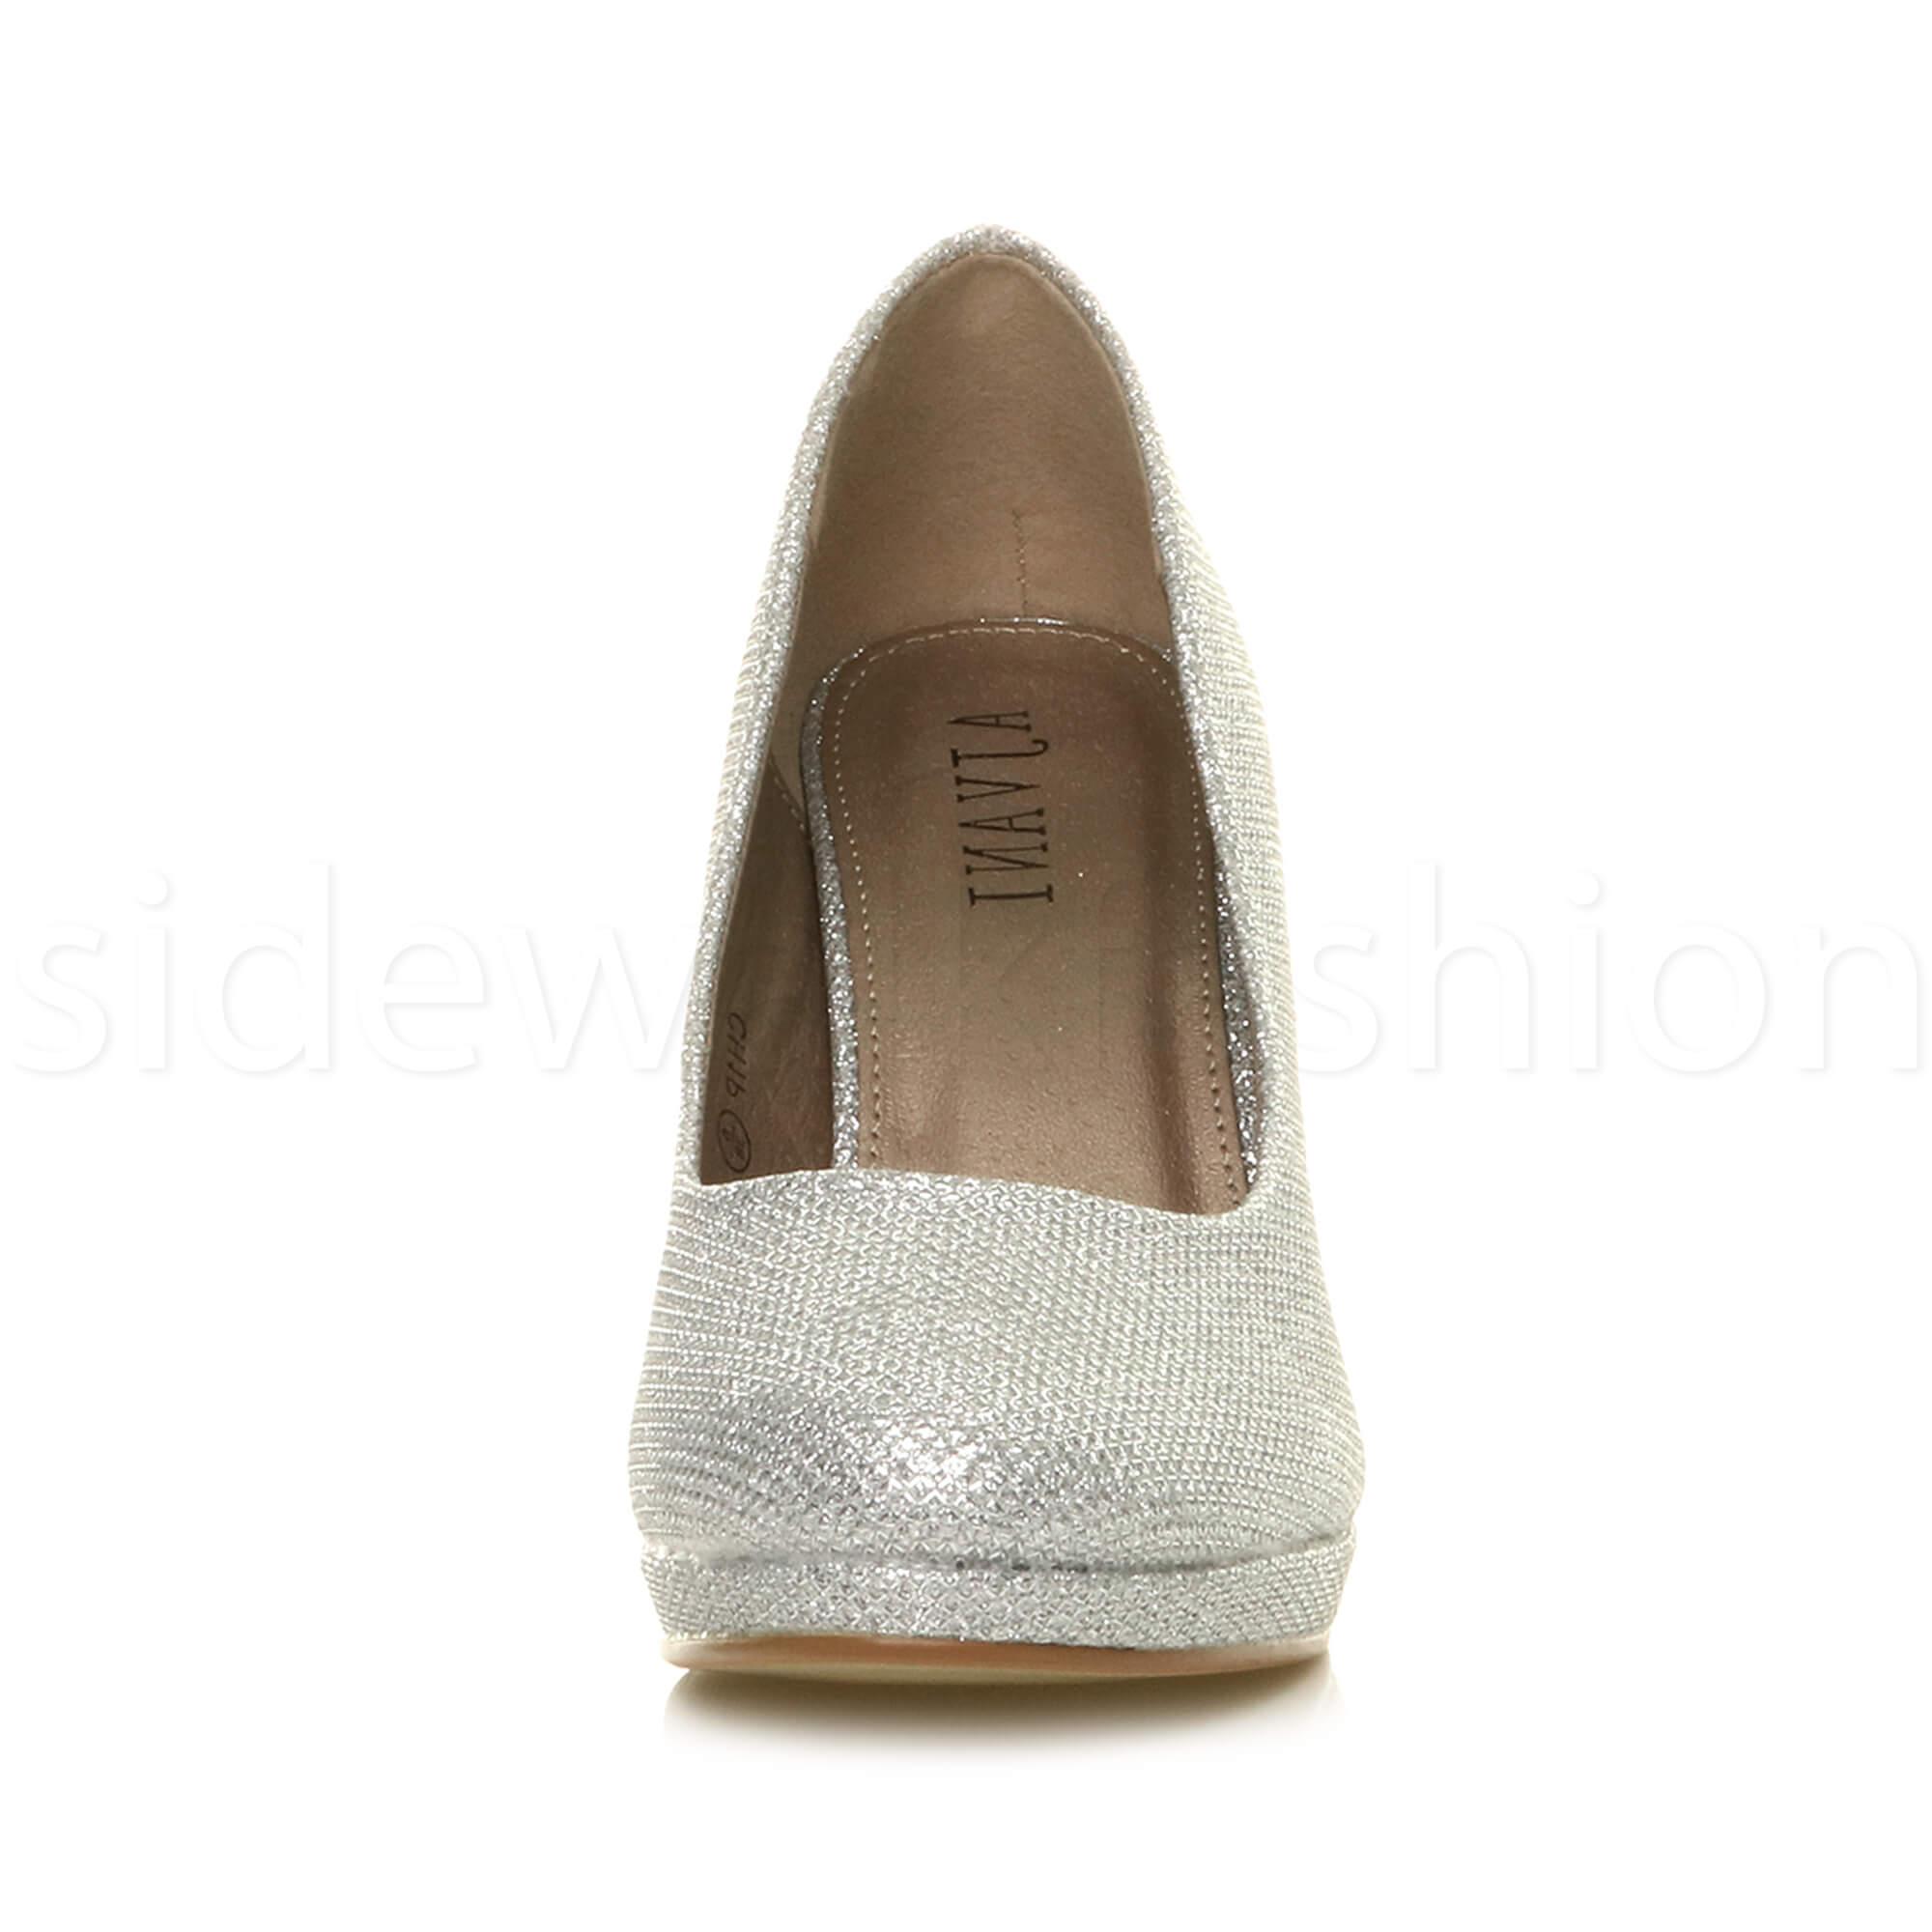 Womens-ladies-high-mid-heel-platform-wedding-evening-bridesmaid-court-shoes-size thumbnail 174